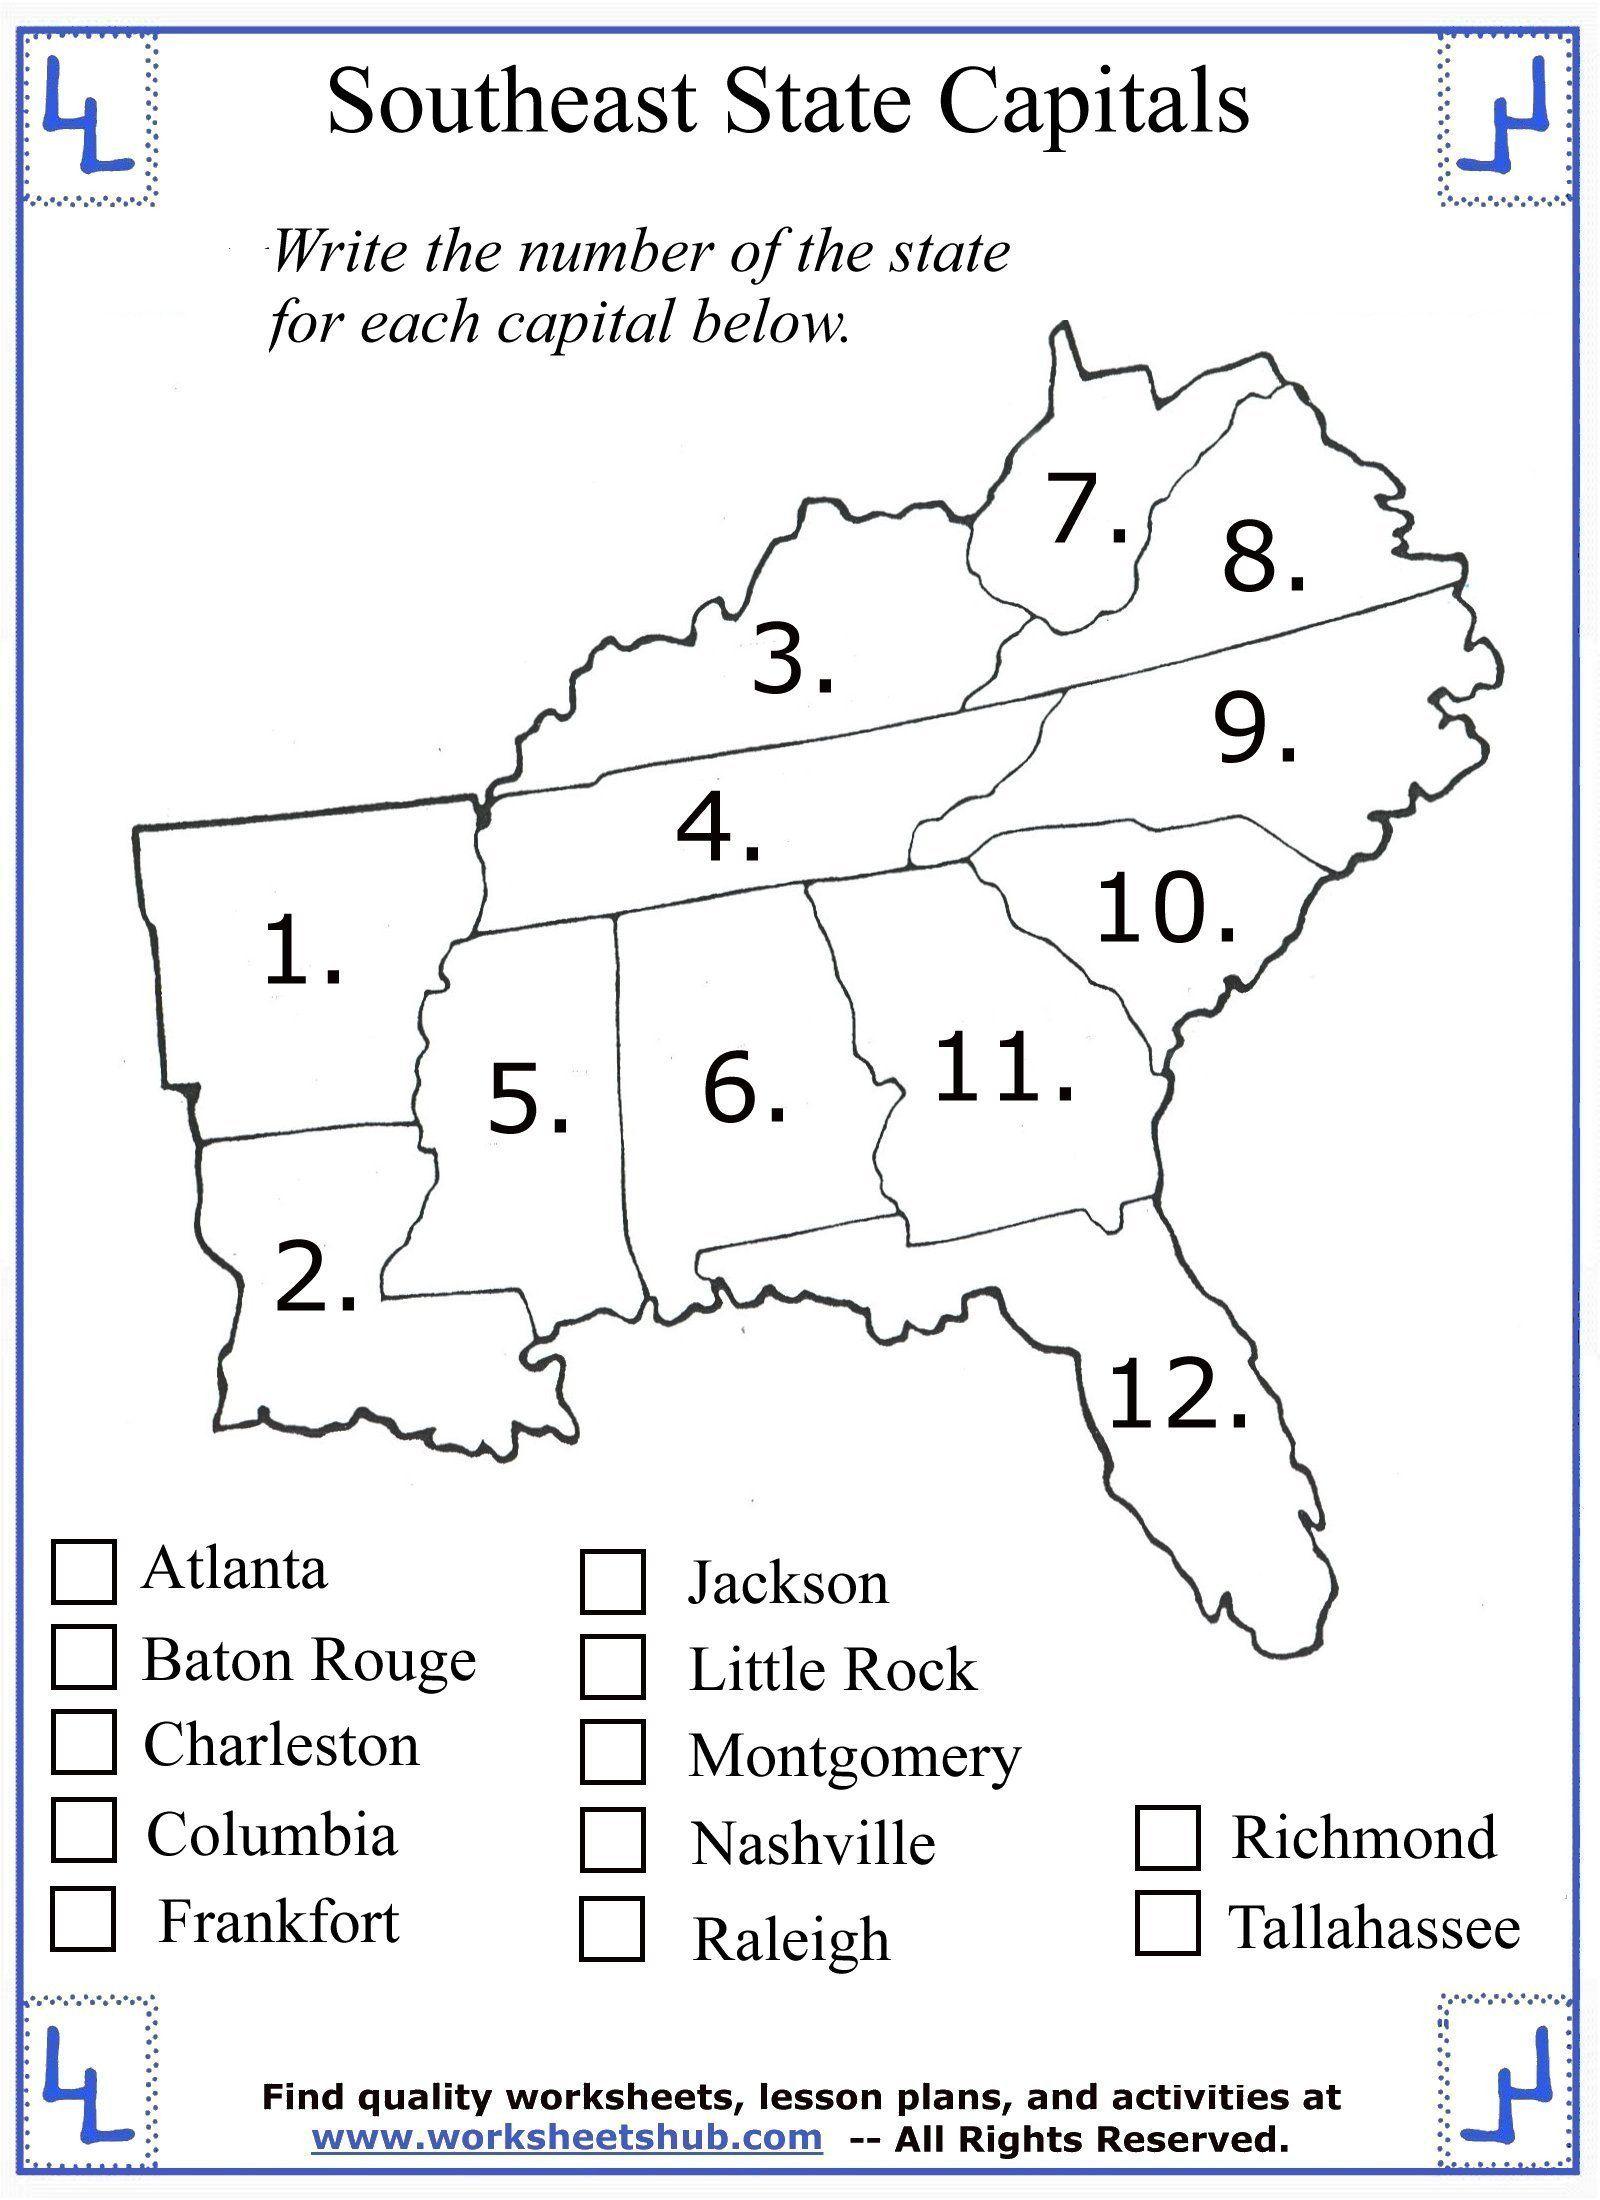 1st Grade Social Studies Worksheets 4th Grade Social Stu S Southeast Region States In 2020 Social Studies Worksheets 4th Grade Social Studies History Worksheets